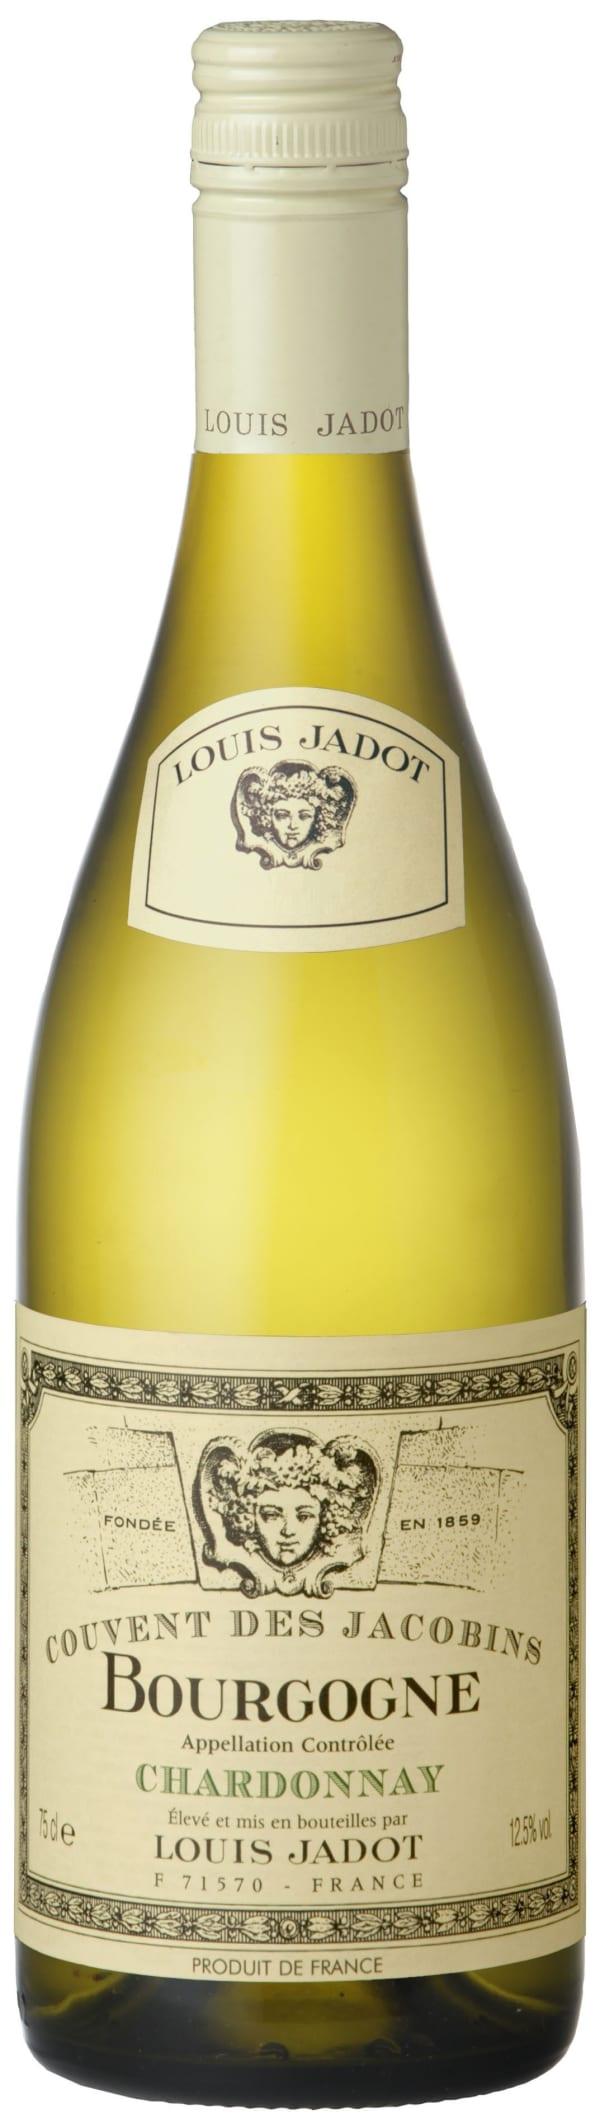 Louis Jadot Les Petites Pierres Chardonnay 2015